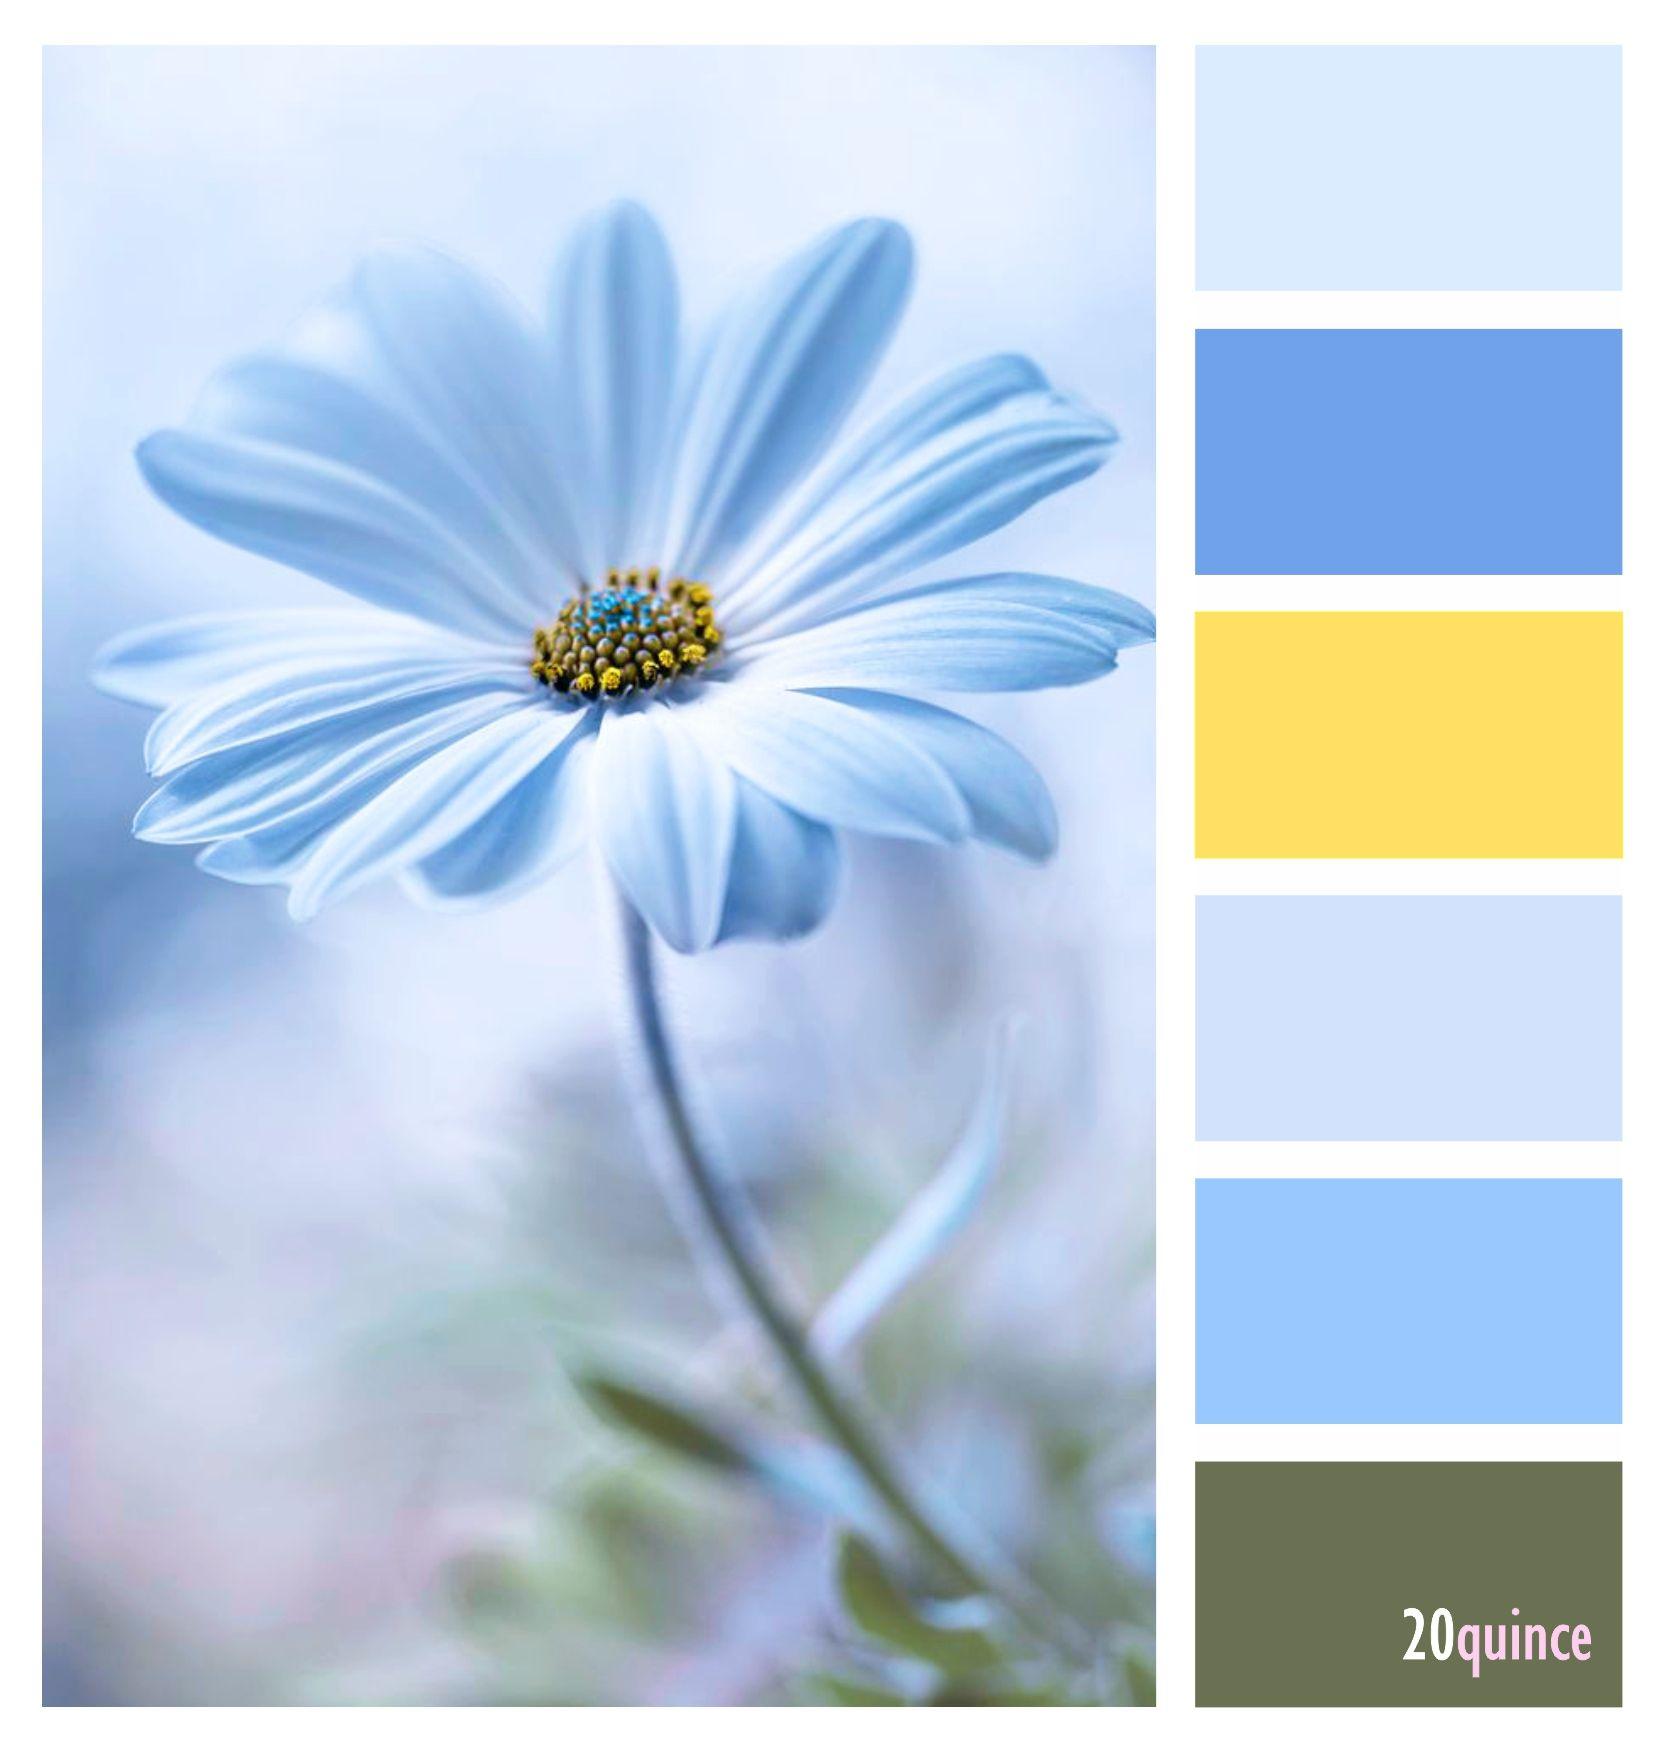 Pin by leticia de robles on colores 20quince pinterest design 411 blue yellowblue daisyblueslanguage of flowersflowers izmirmasajfo